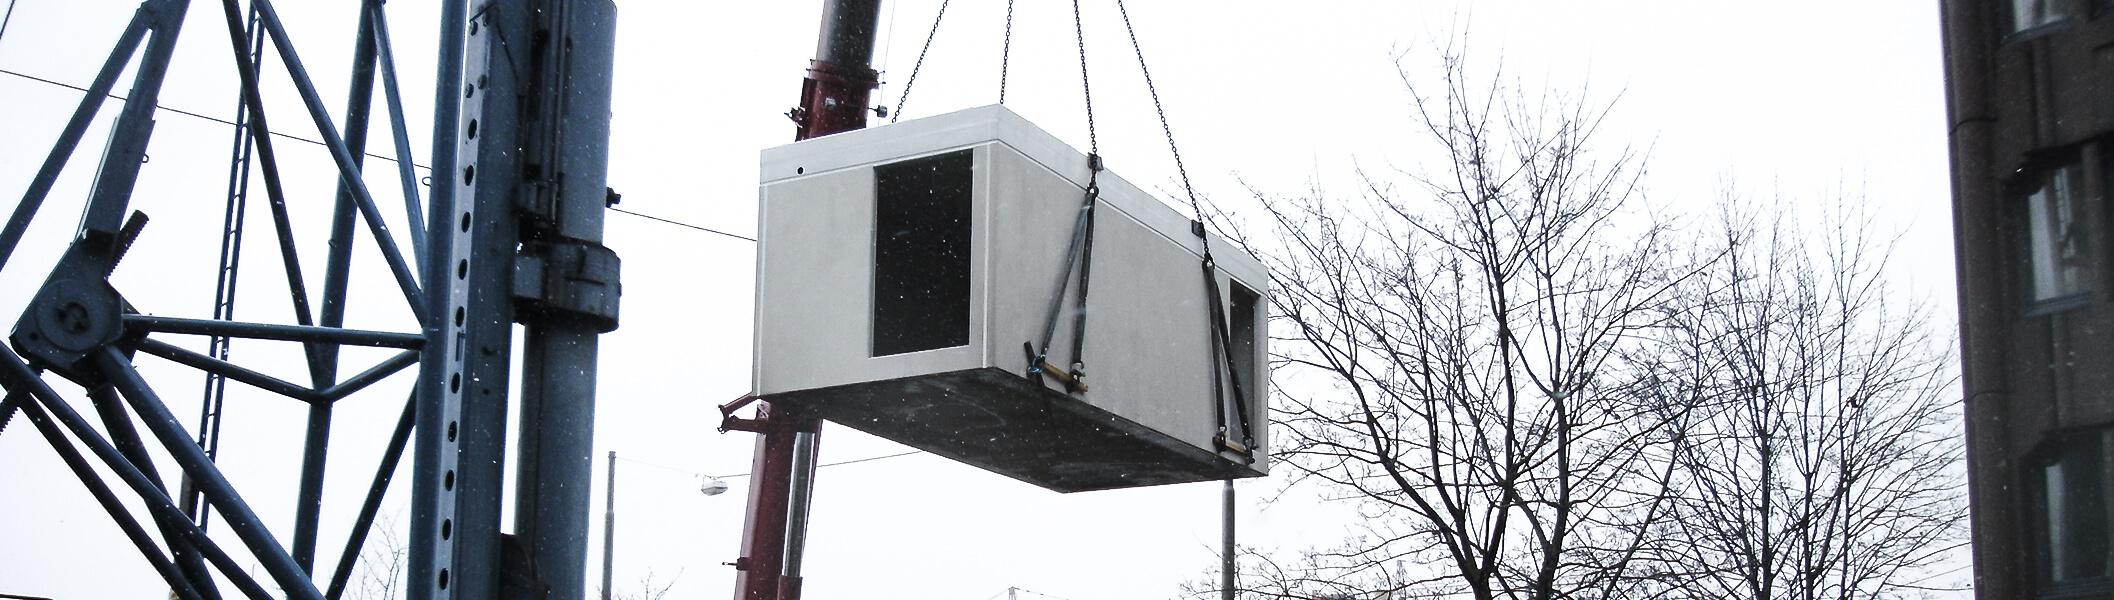 Notstromanlage Container